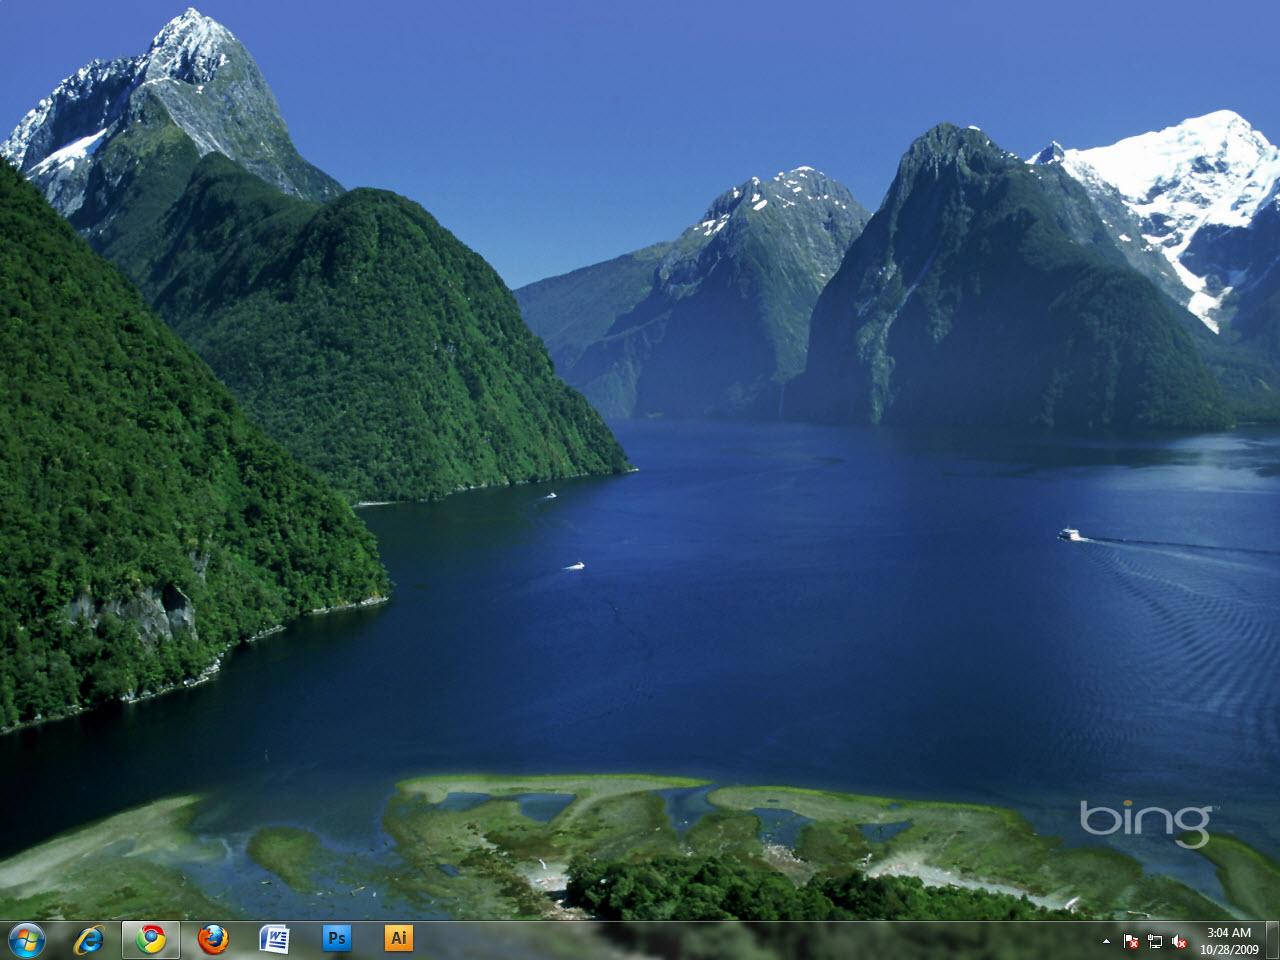 windows 7 themes Desktop Backgrounds 1280x960